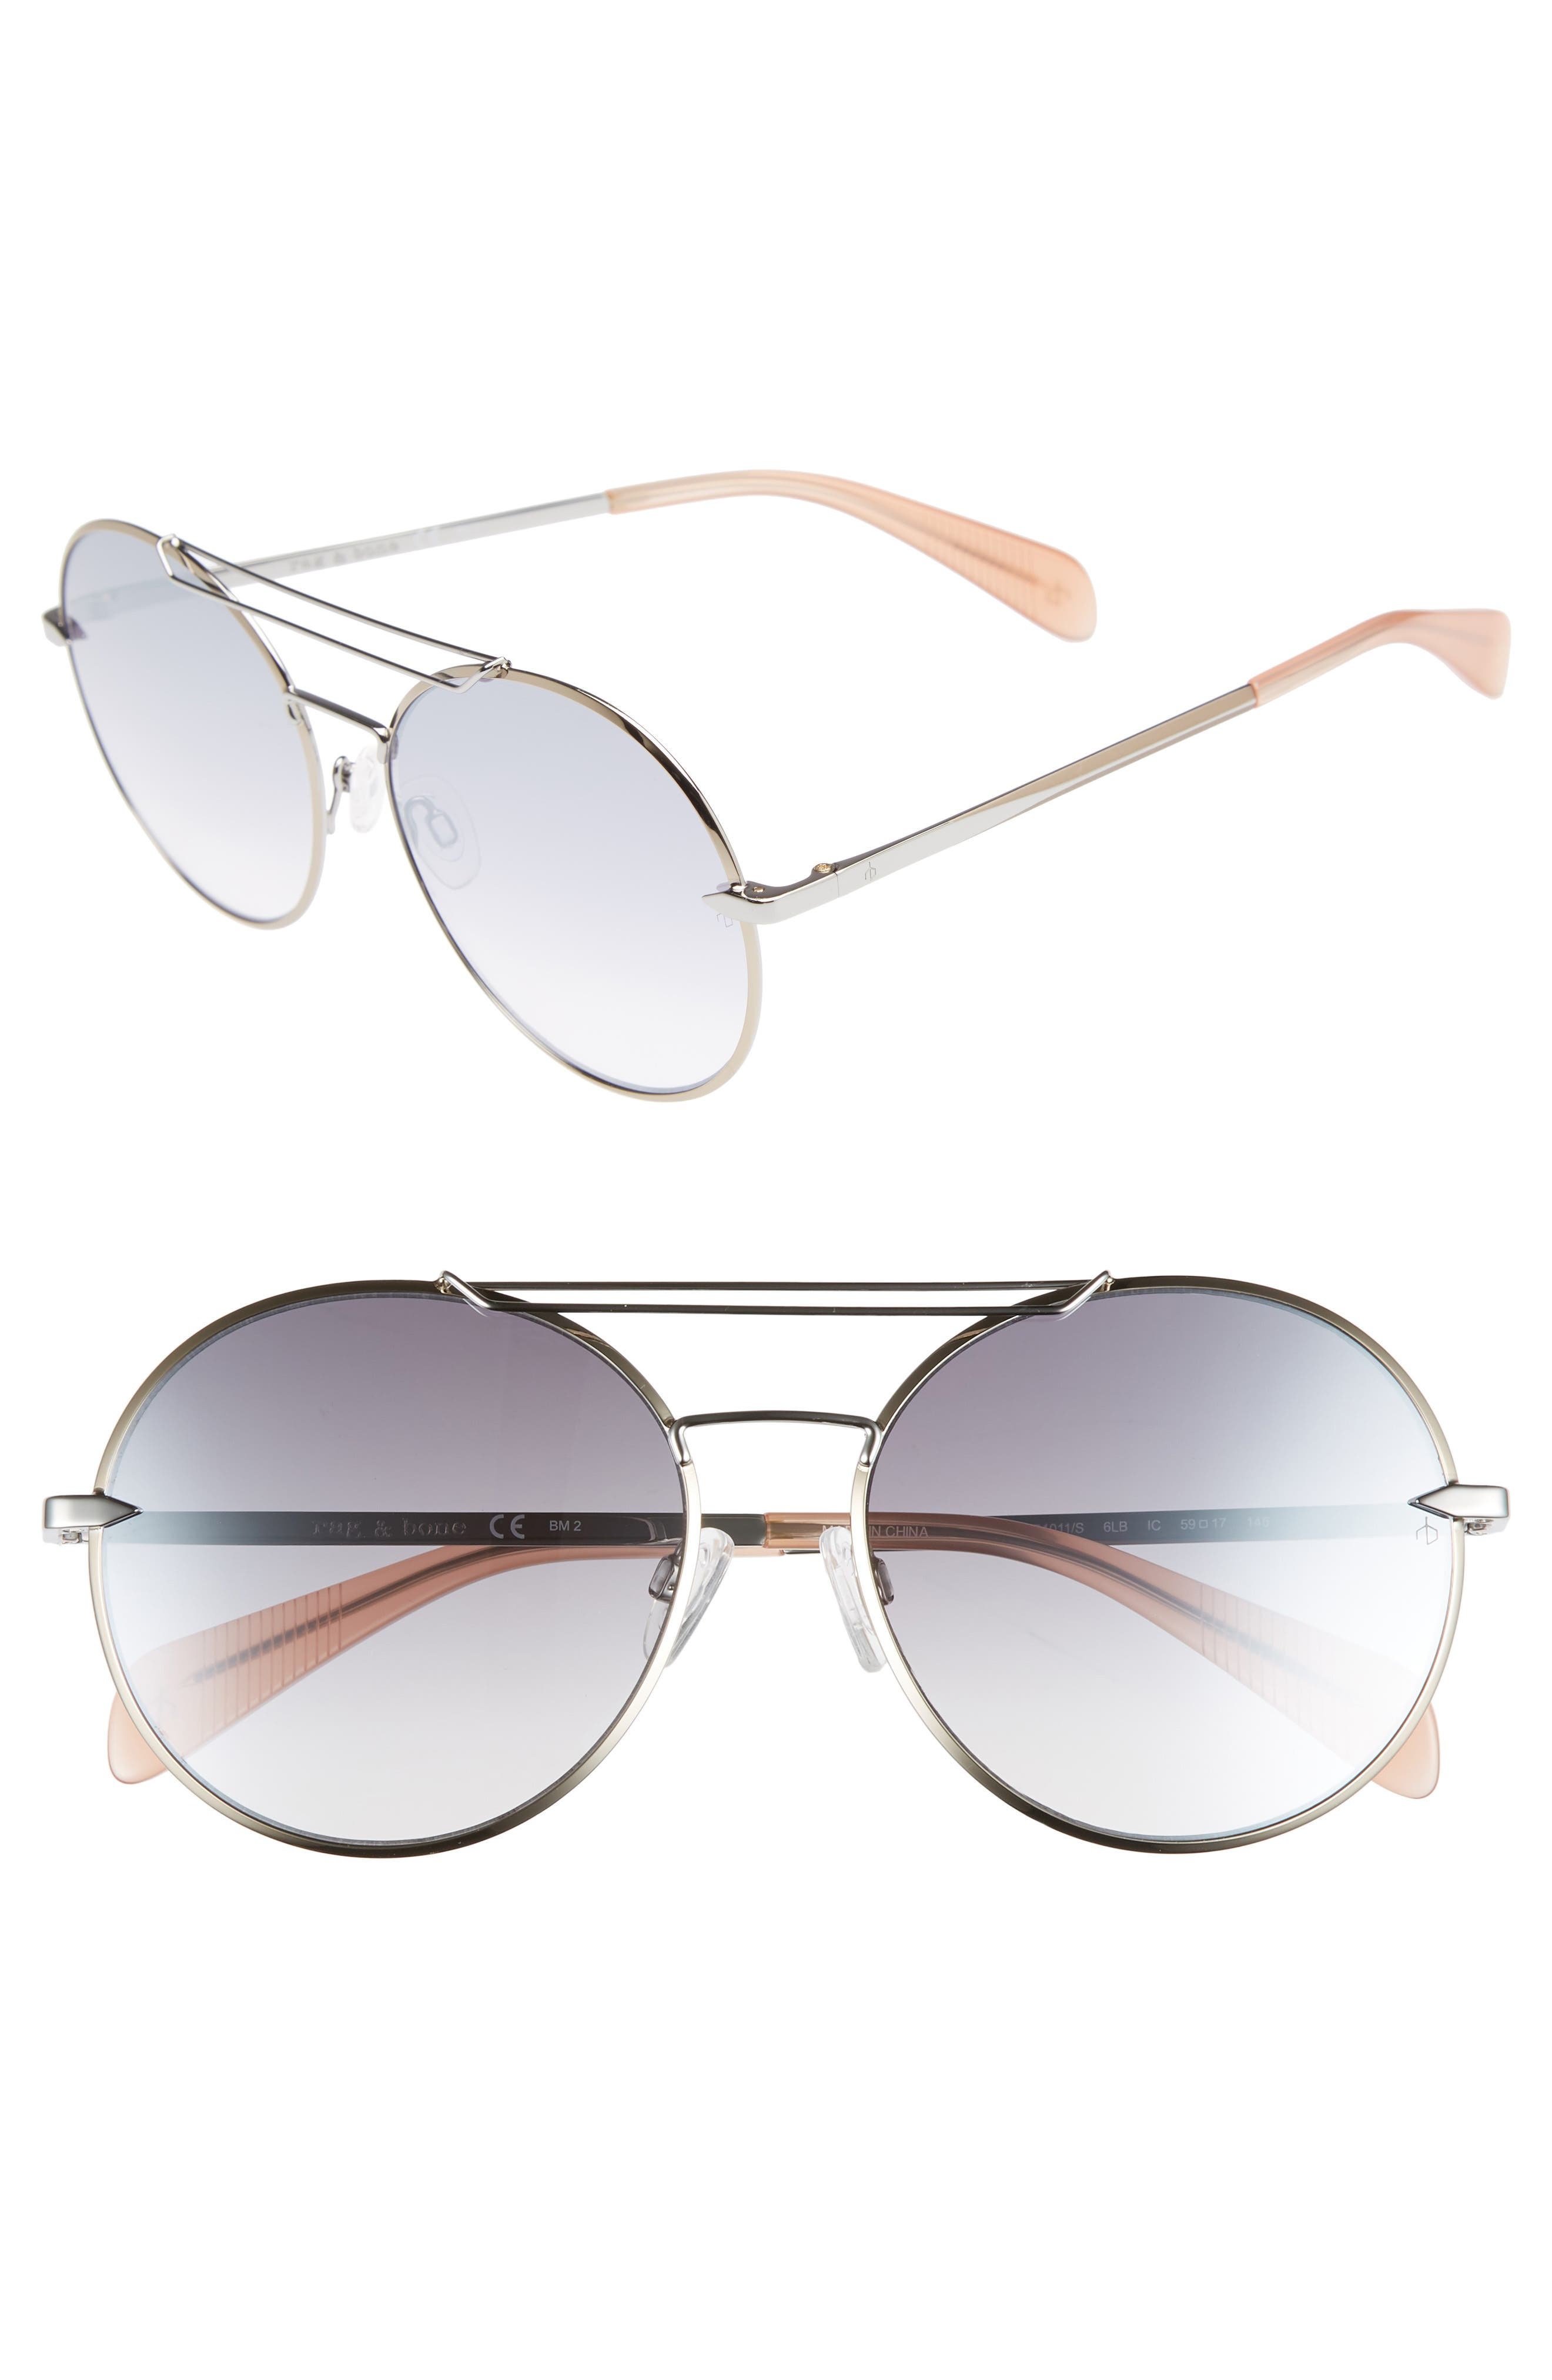 59mm Round Metal Aviator Sunglasses,                             Main thumbnail 1, color,                             RUTHENIUM